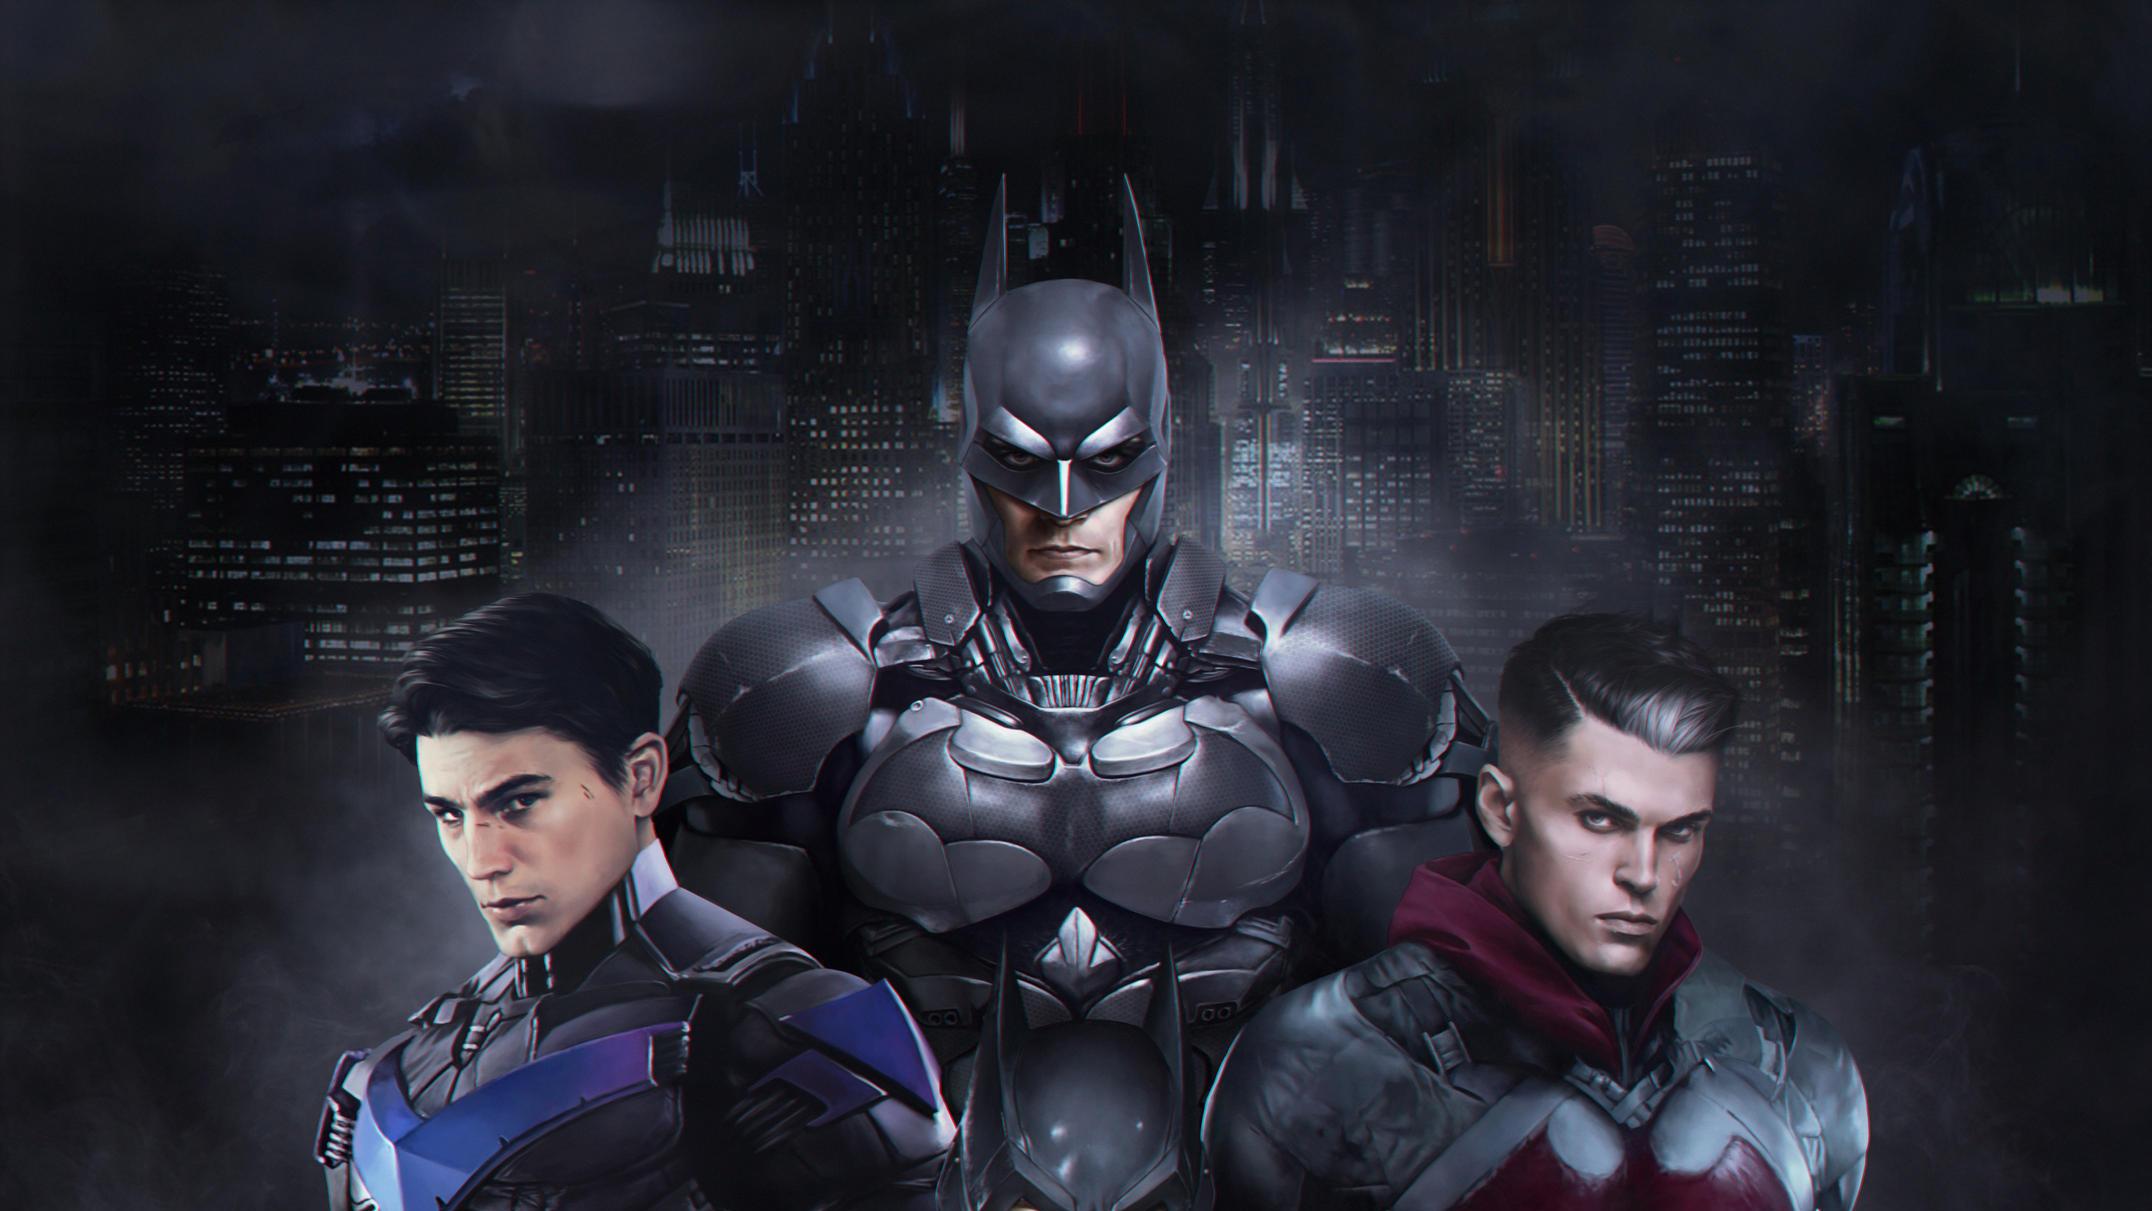 Hd Cute Bat Wallpaper Gothams Bat Family Hd Superheroes 4k Wallpapers Images